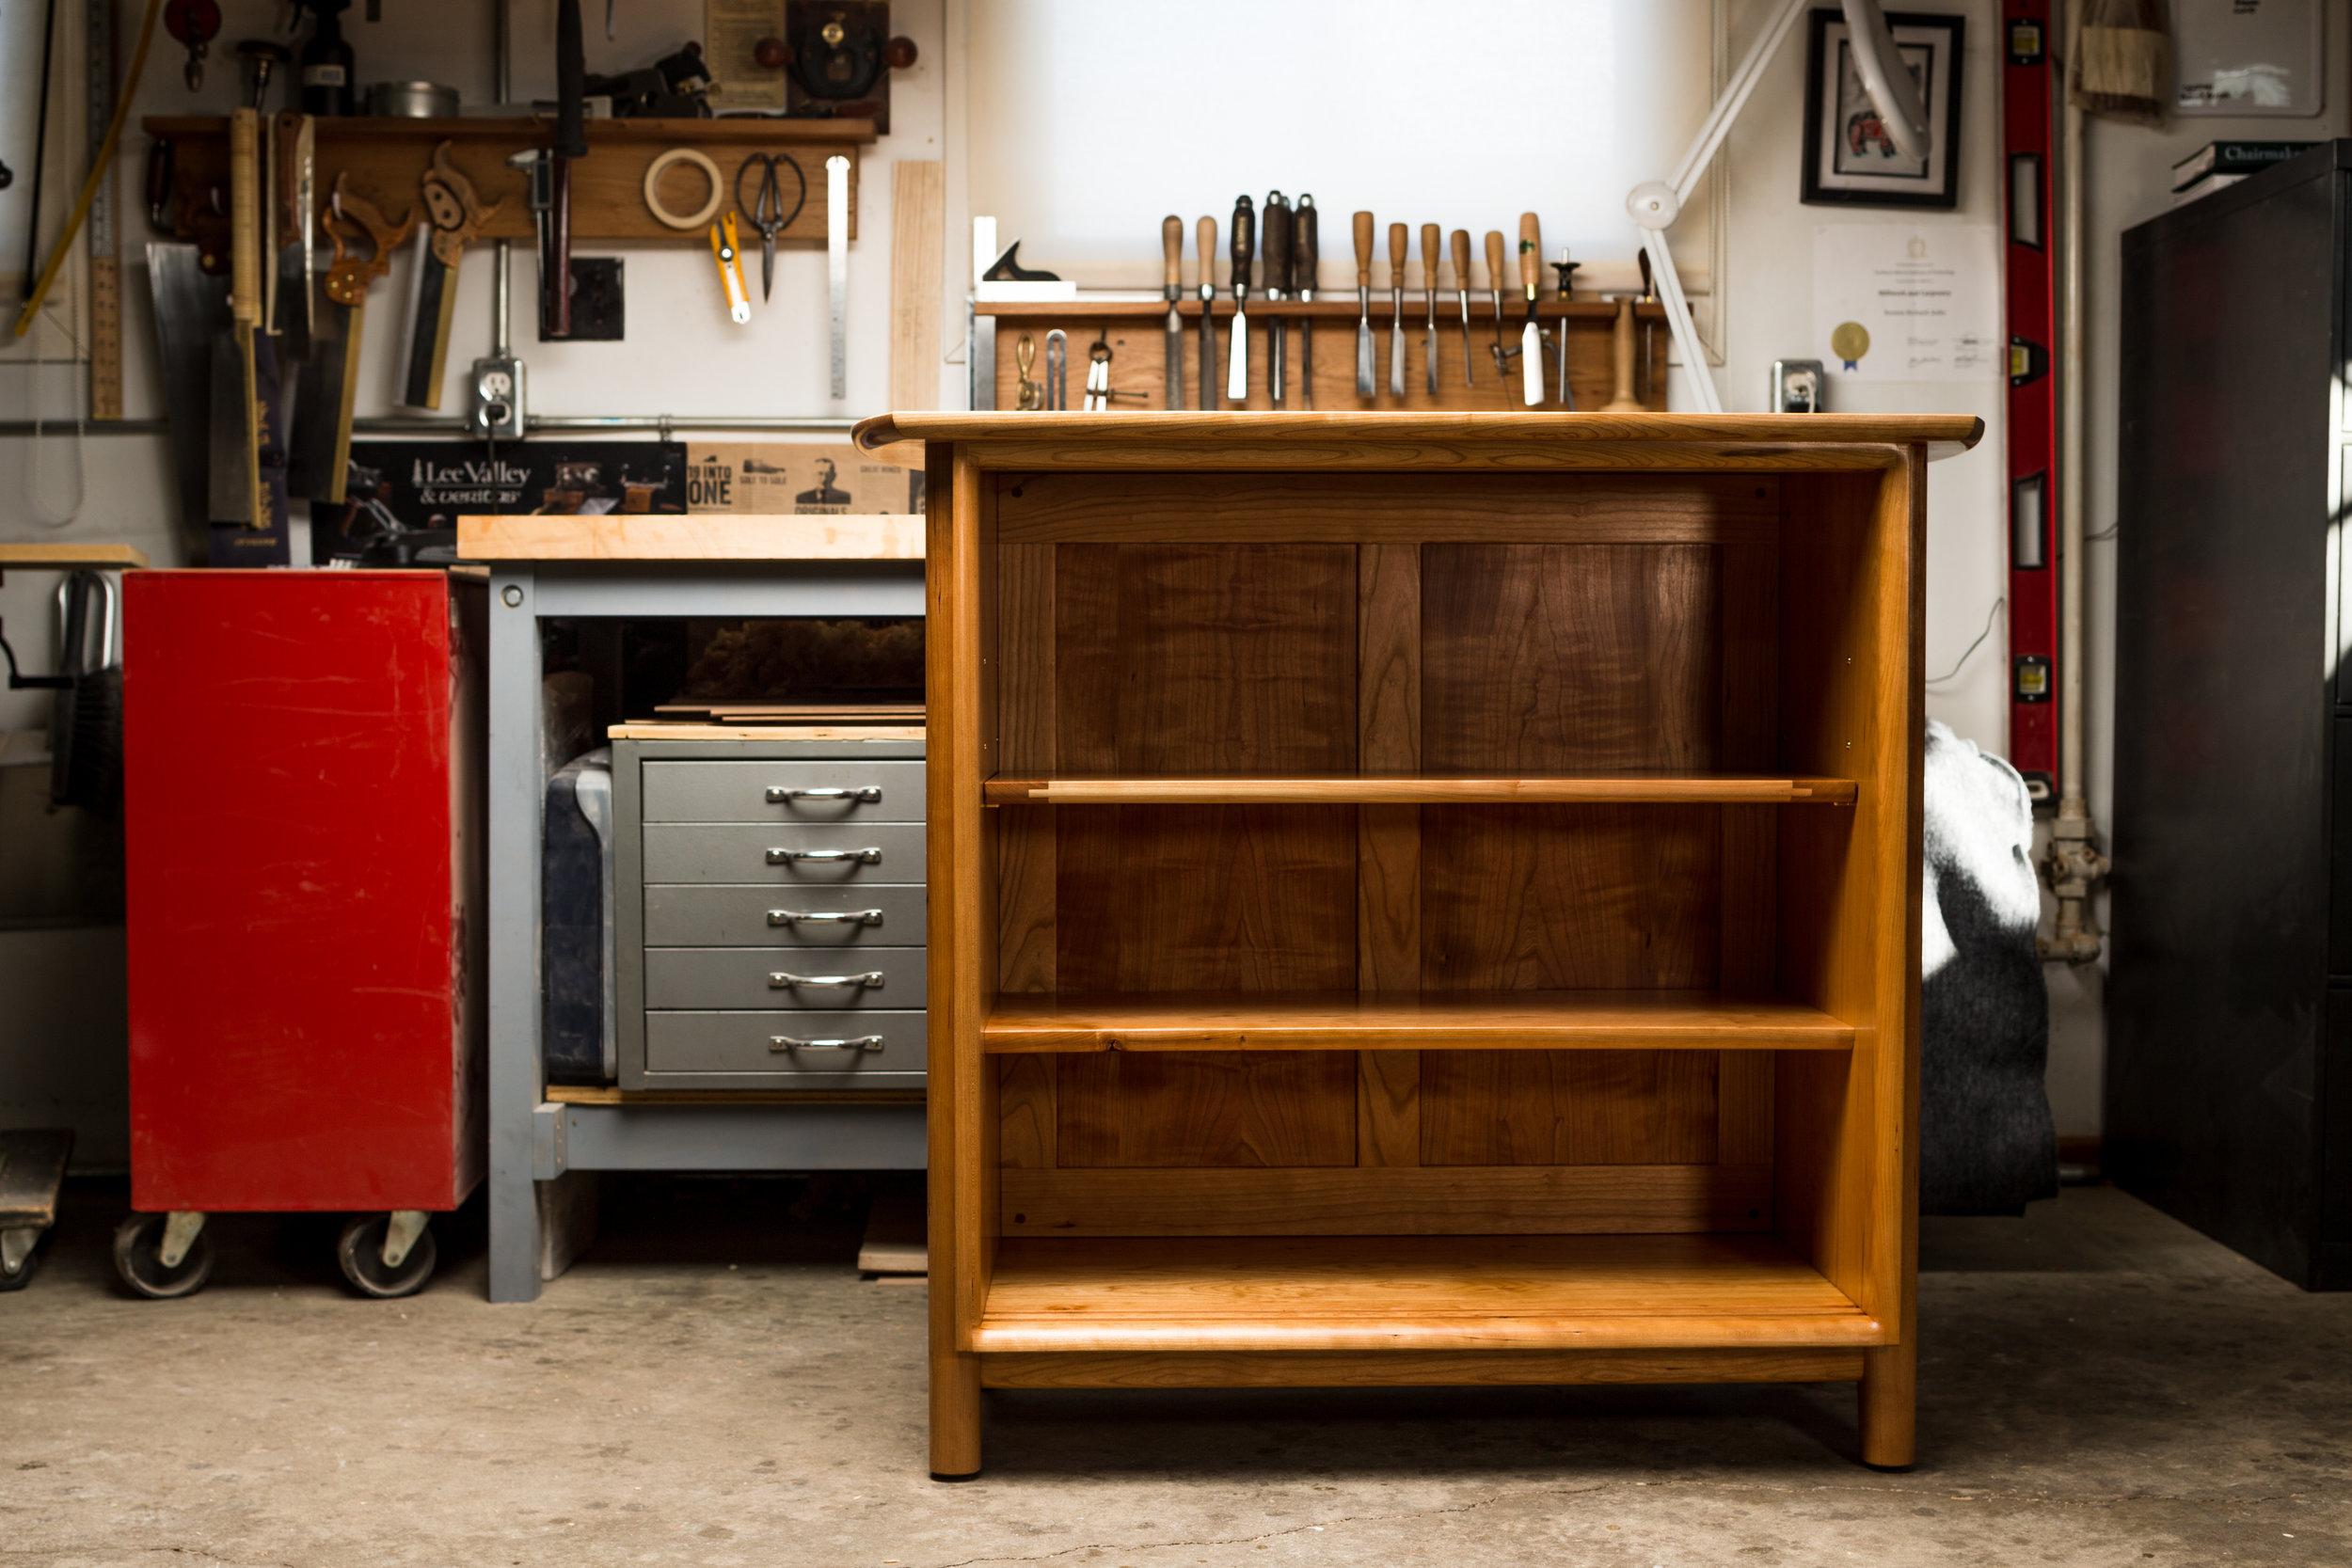 Adjustable top shelf